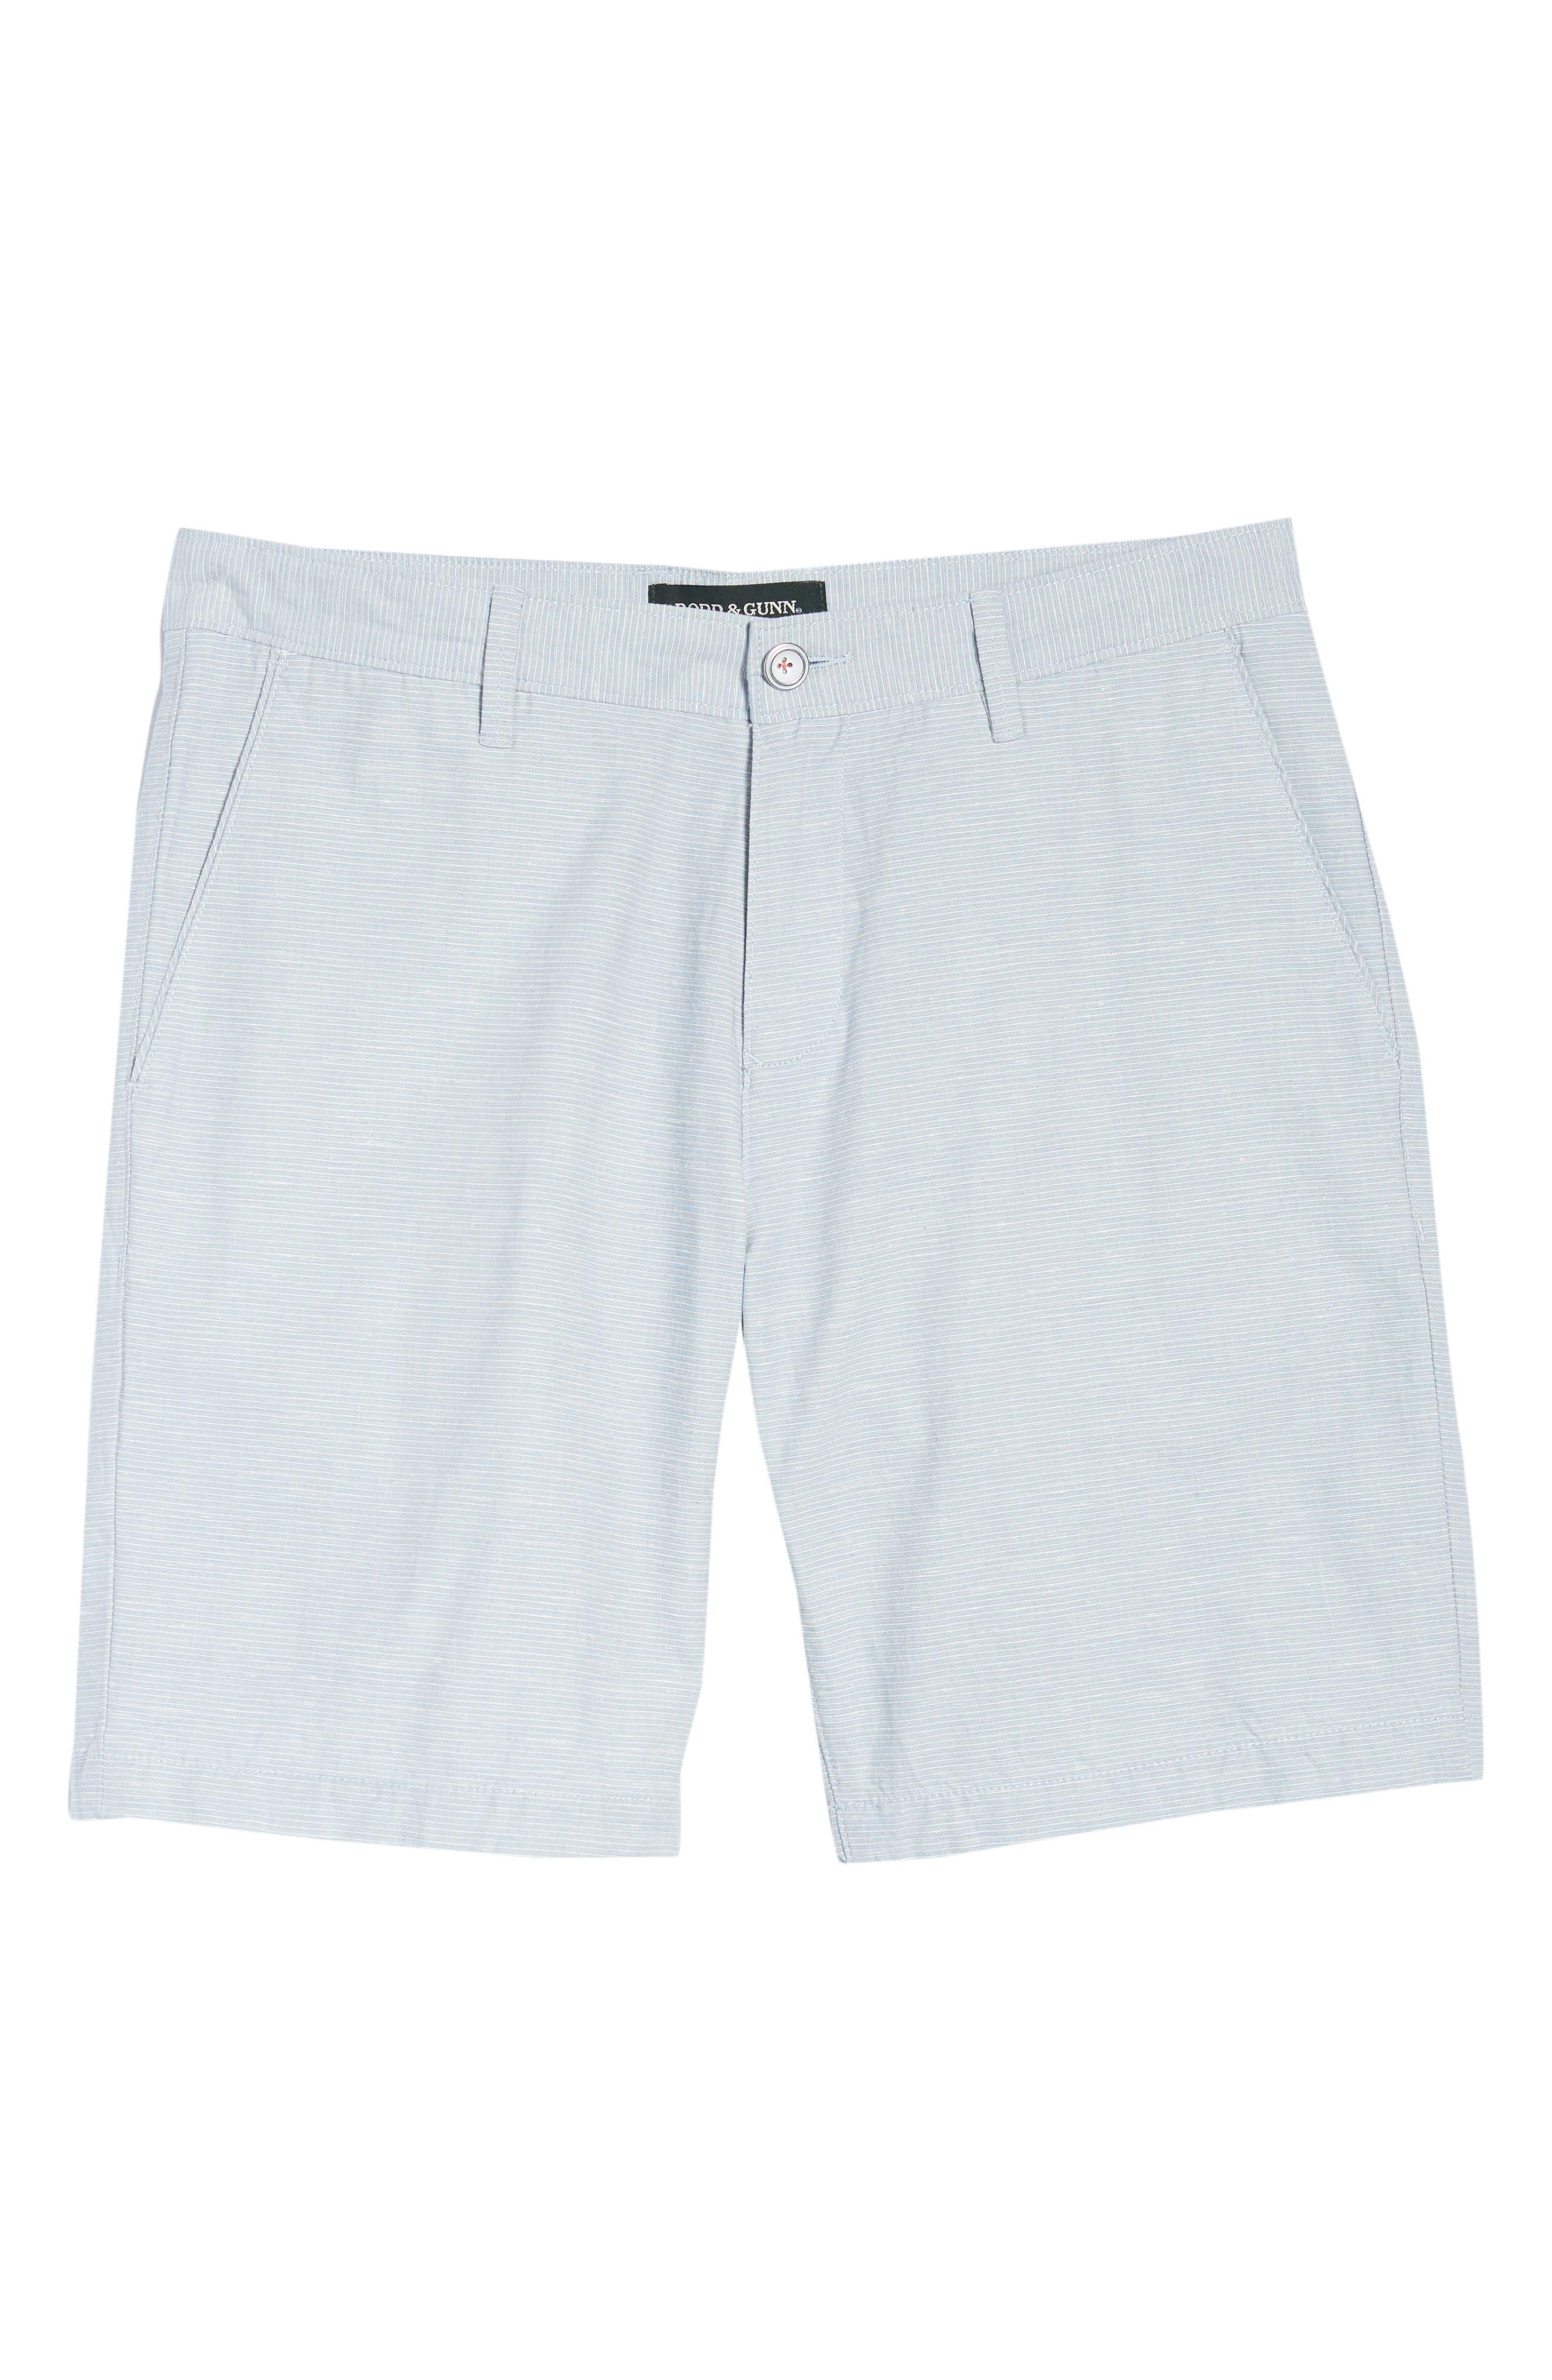 Stoke Valley Shorts,                             Alternate thumbnail 6, color,                             SKY